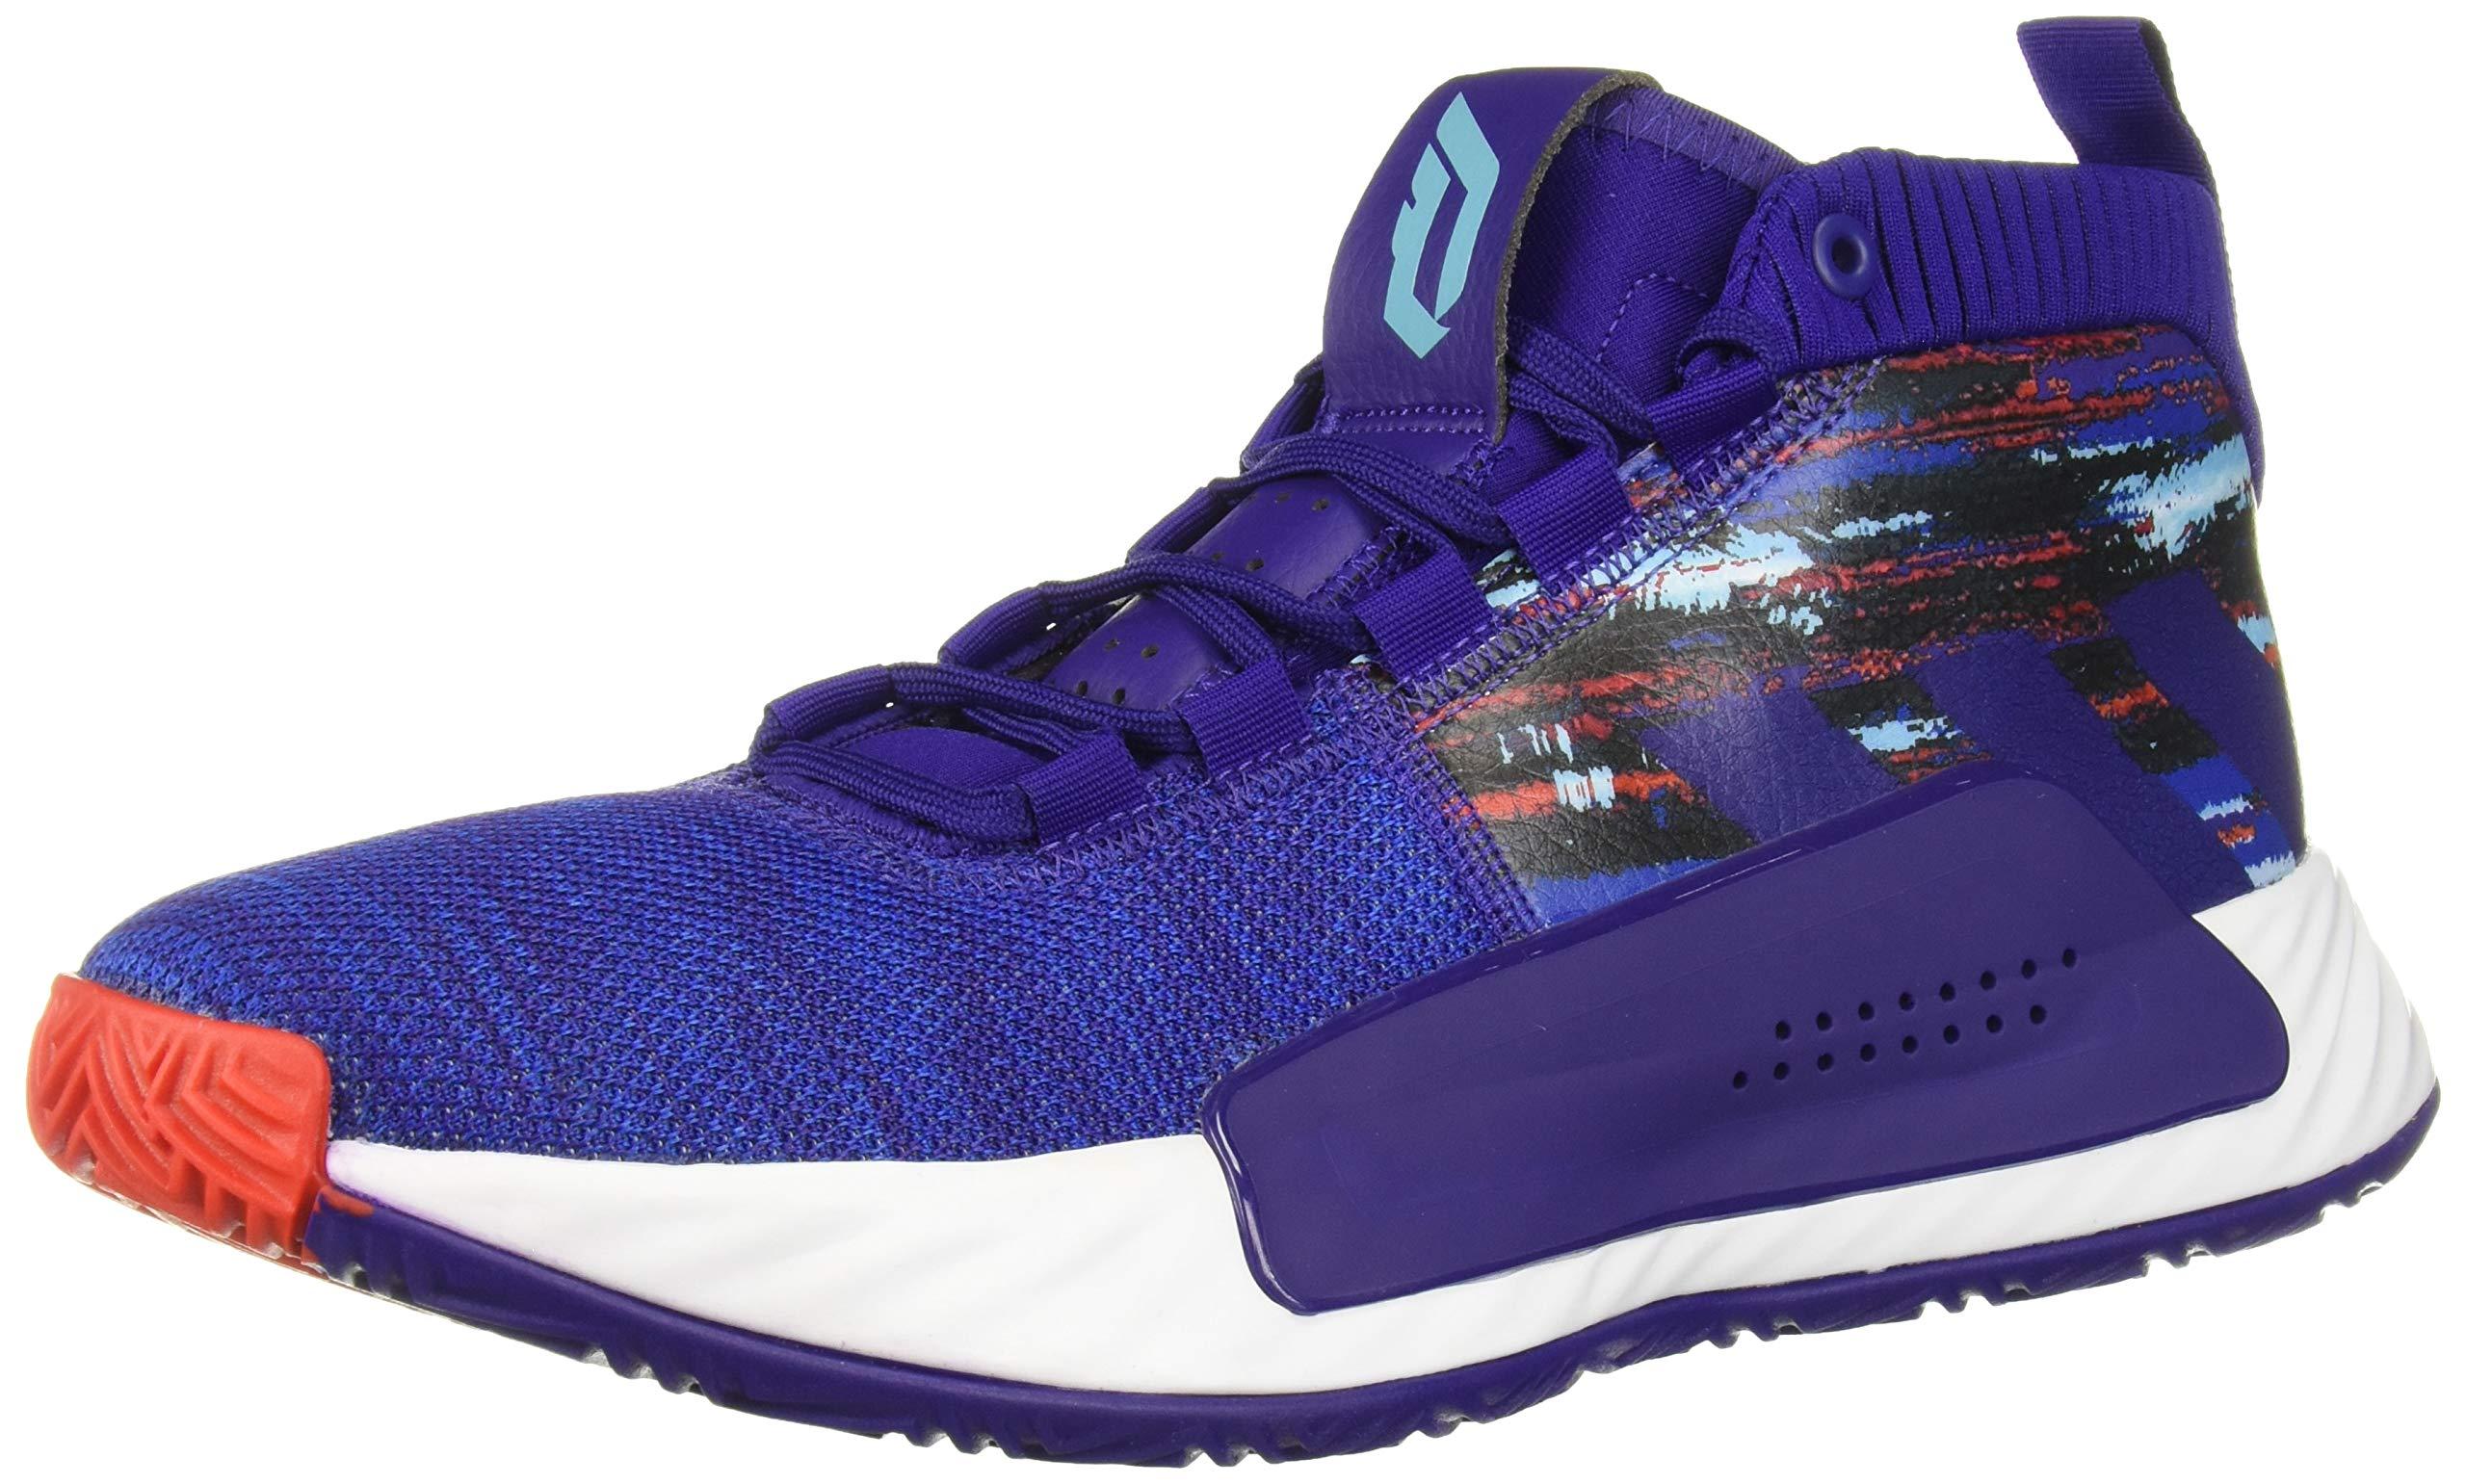 adidas Men's Dame 5 Basketball Shoe, Purple/Collegiate Royal/White, 11 M US by adidas